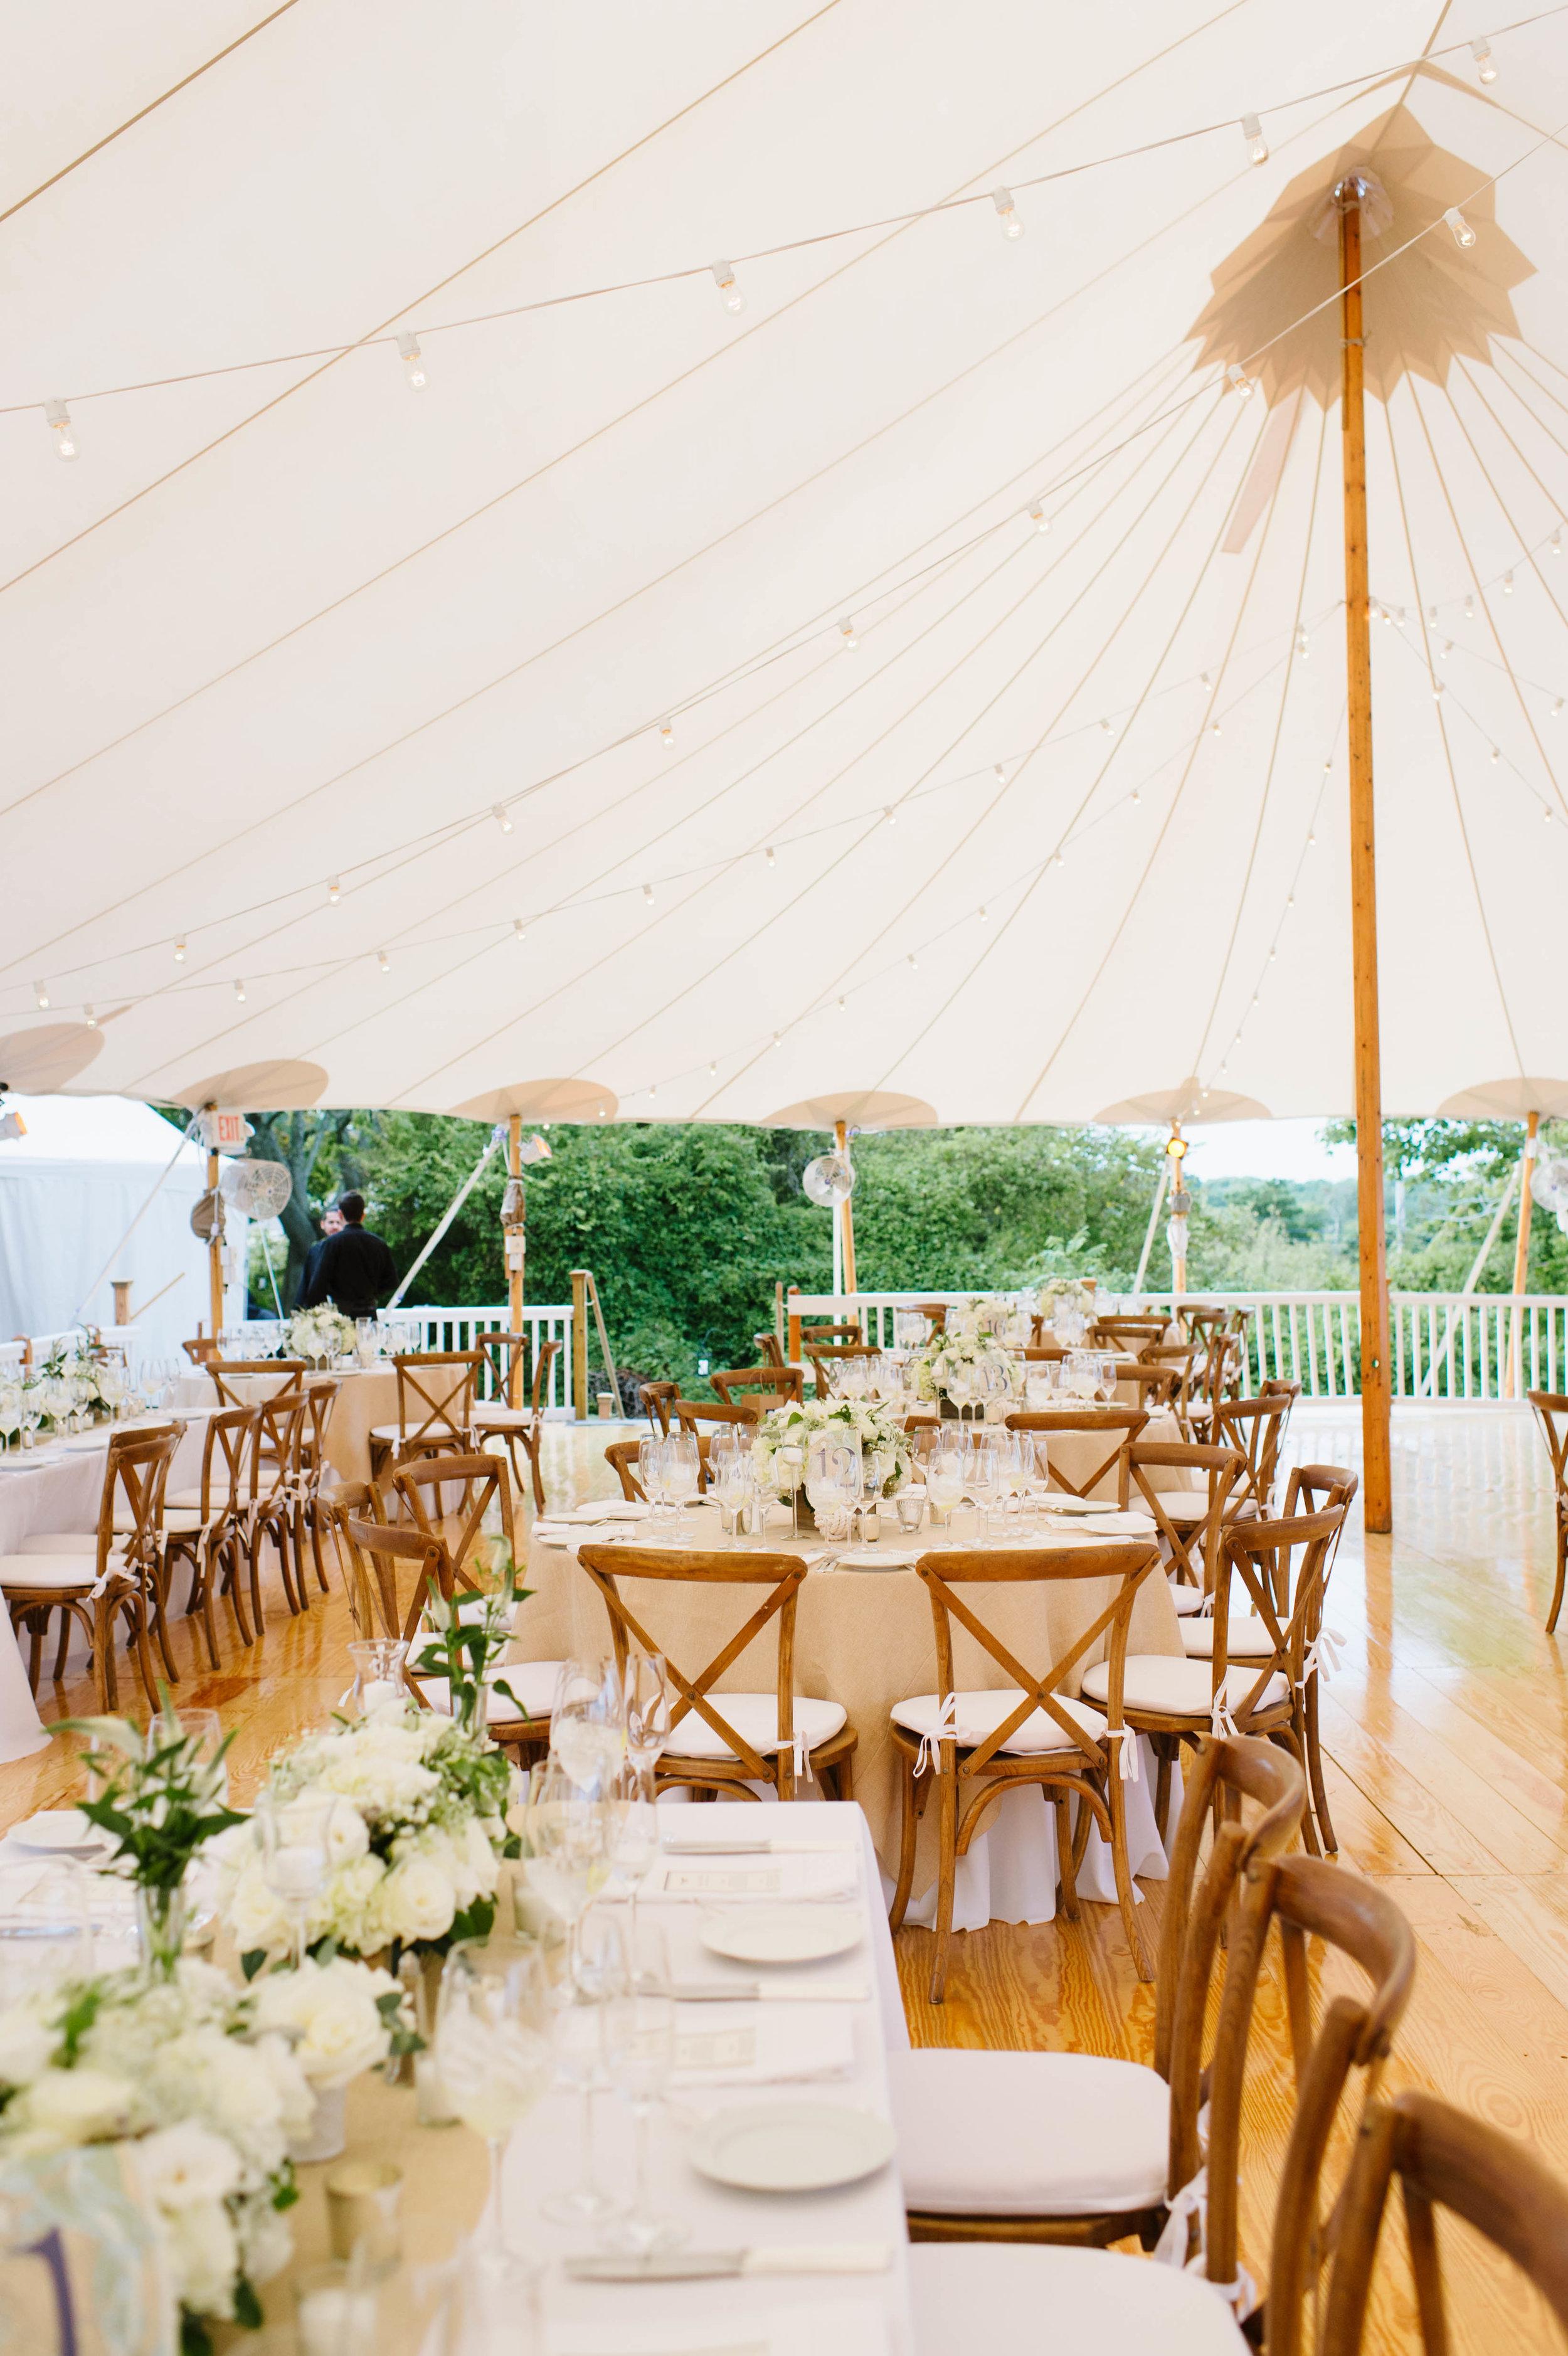 Candid-Wedding-Photography024.jpg